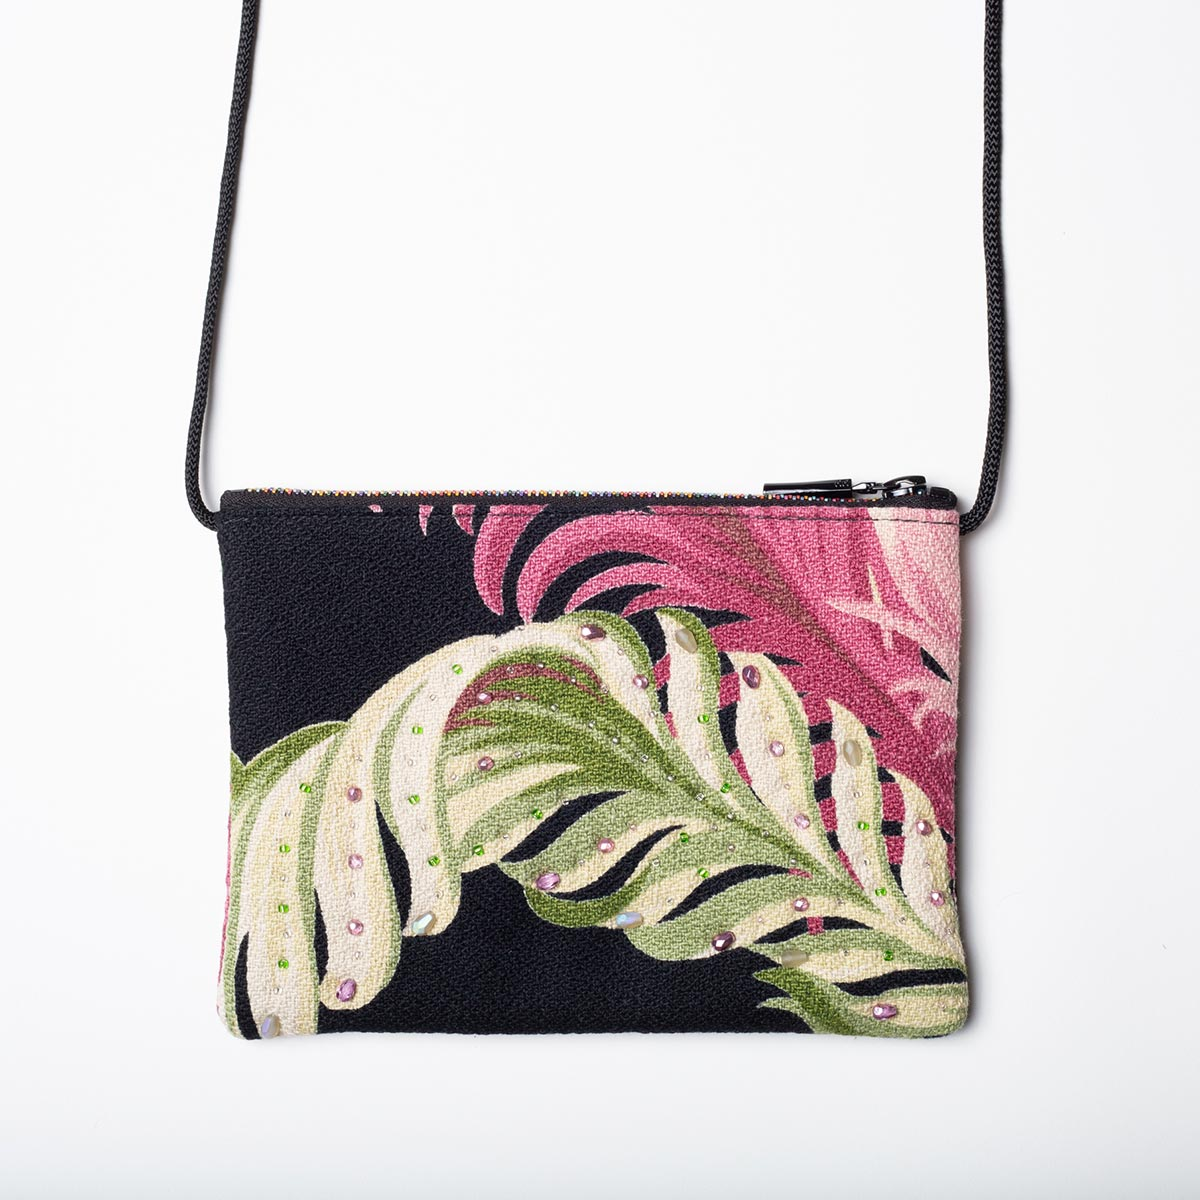 The Opera Bag – Fern Motif on Black